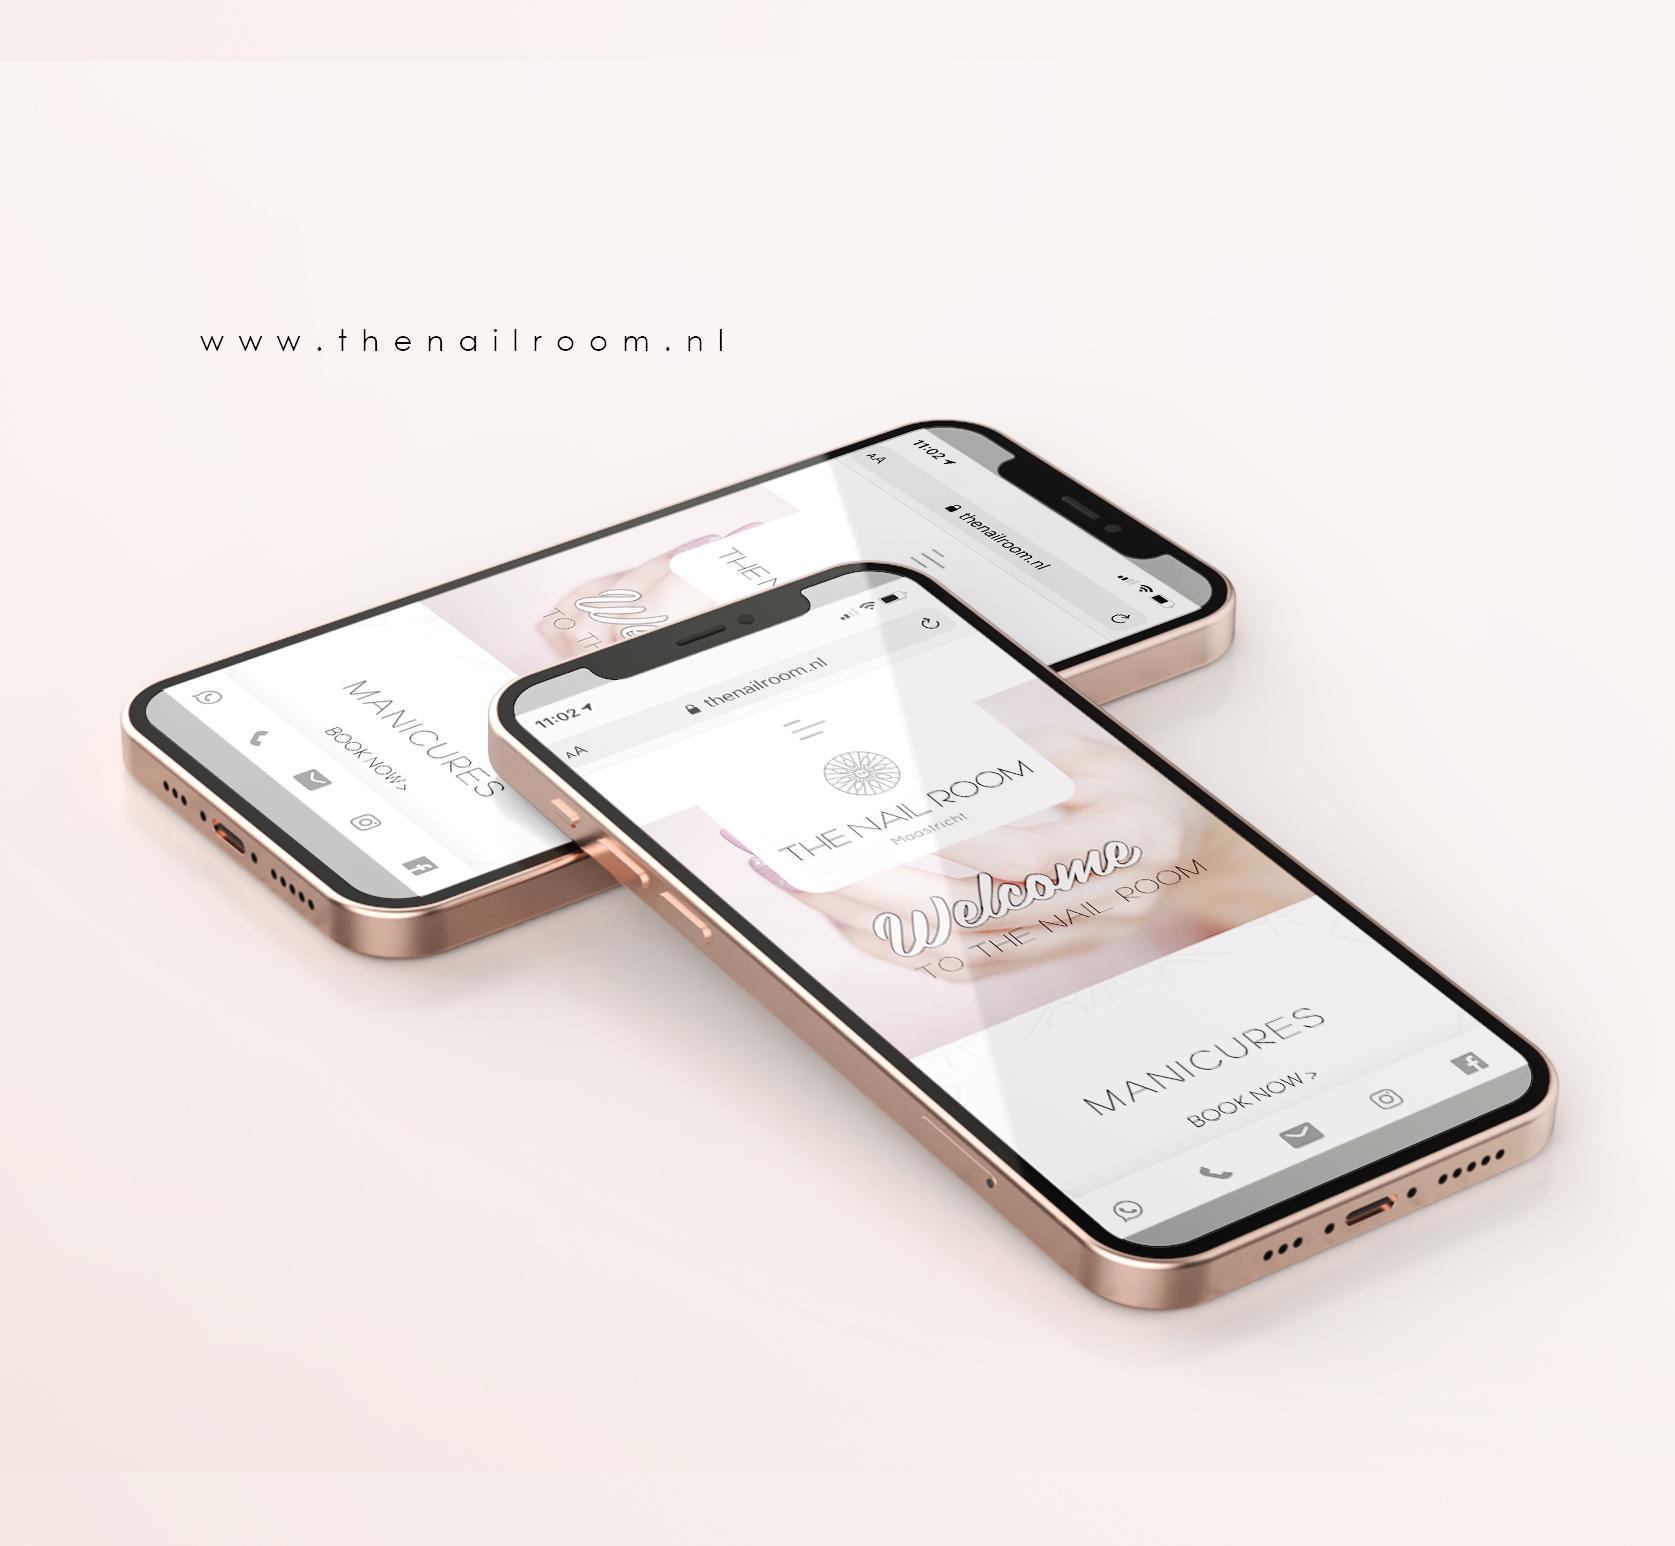 thenailroom Kickstarter 2 package: https://www.houseofcommunic...